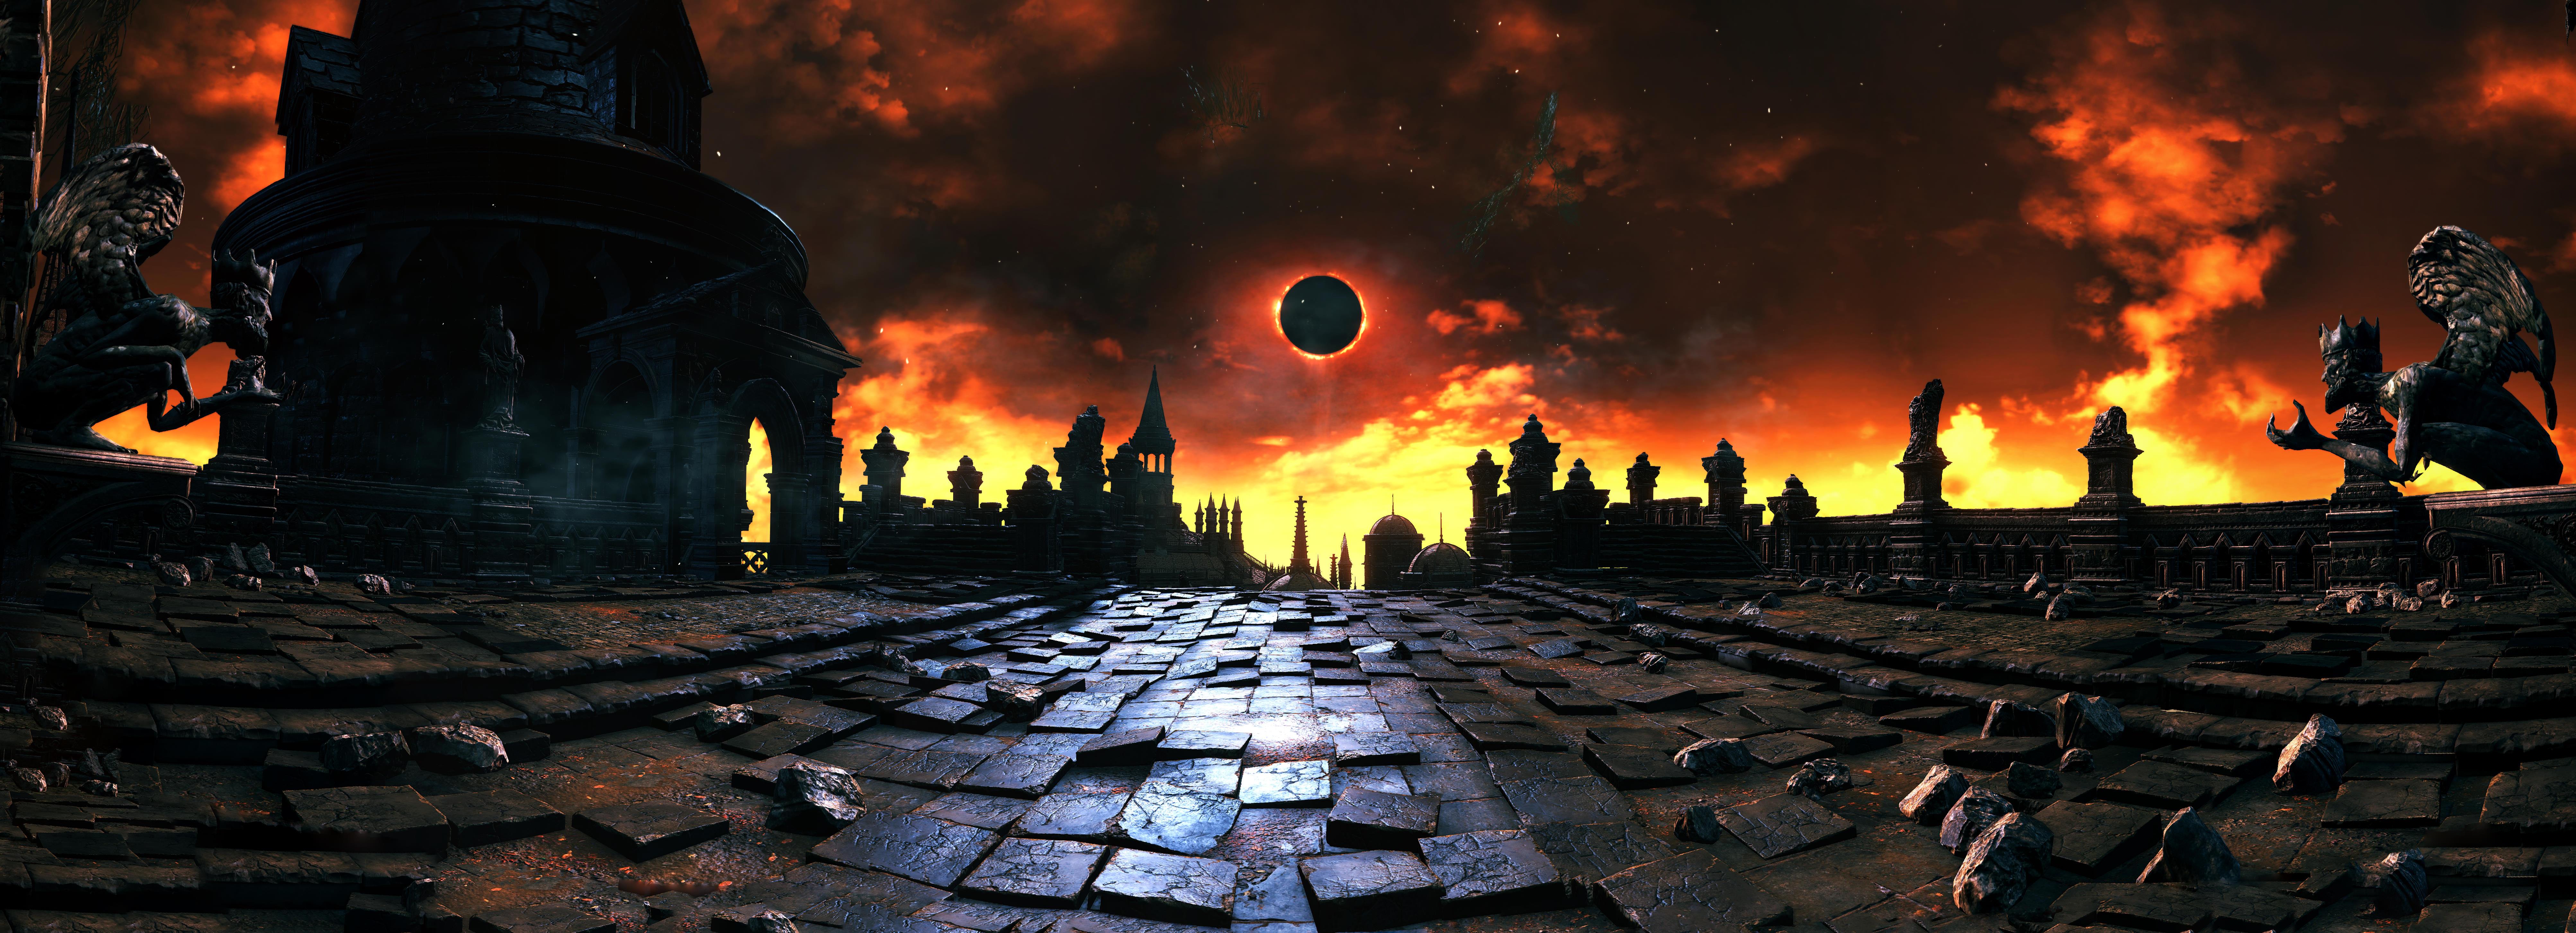 Dark Souls Iii 5k Retina Ultra Hd Wallpaper Background Image